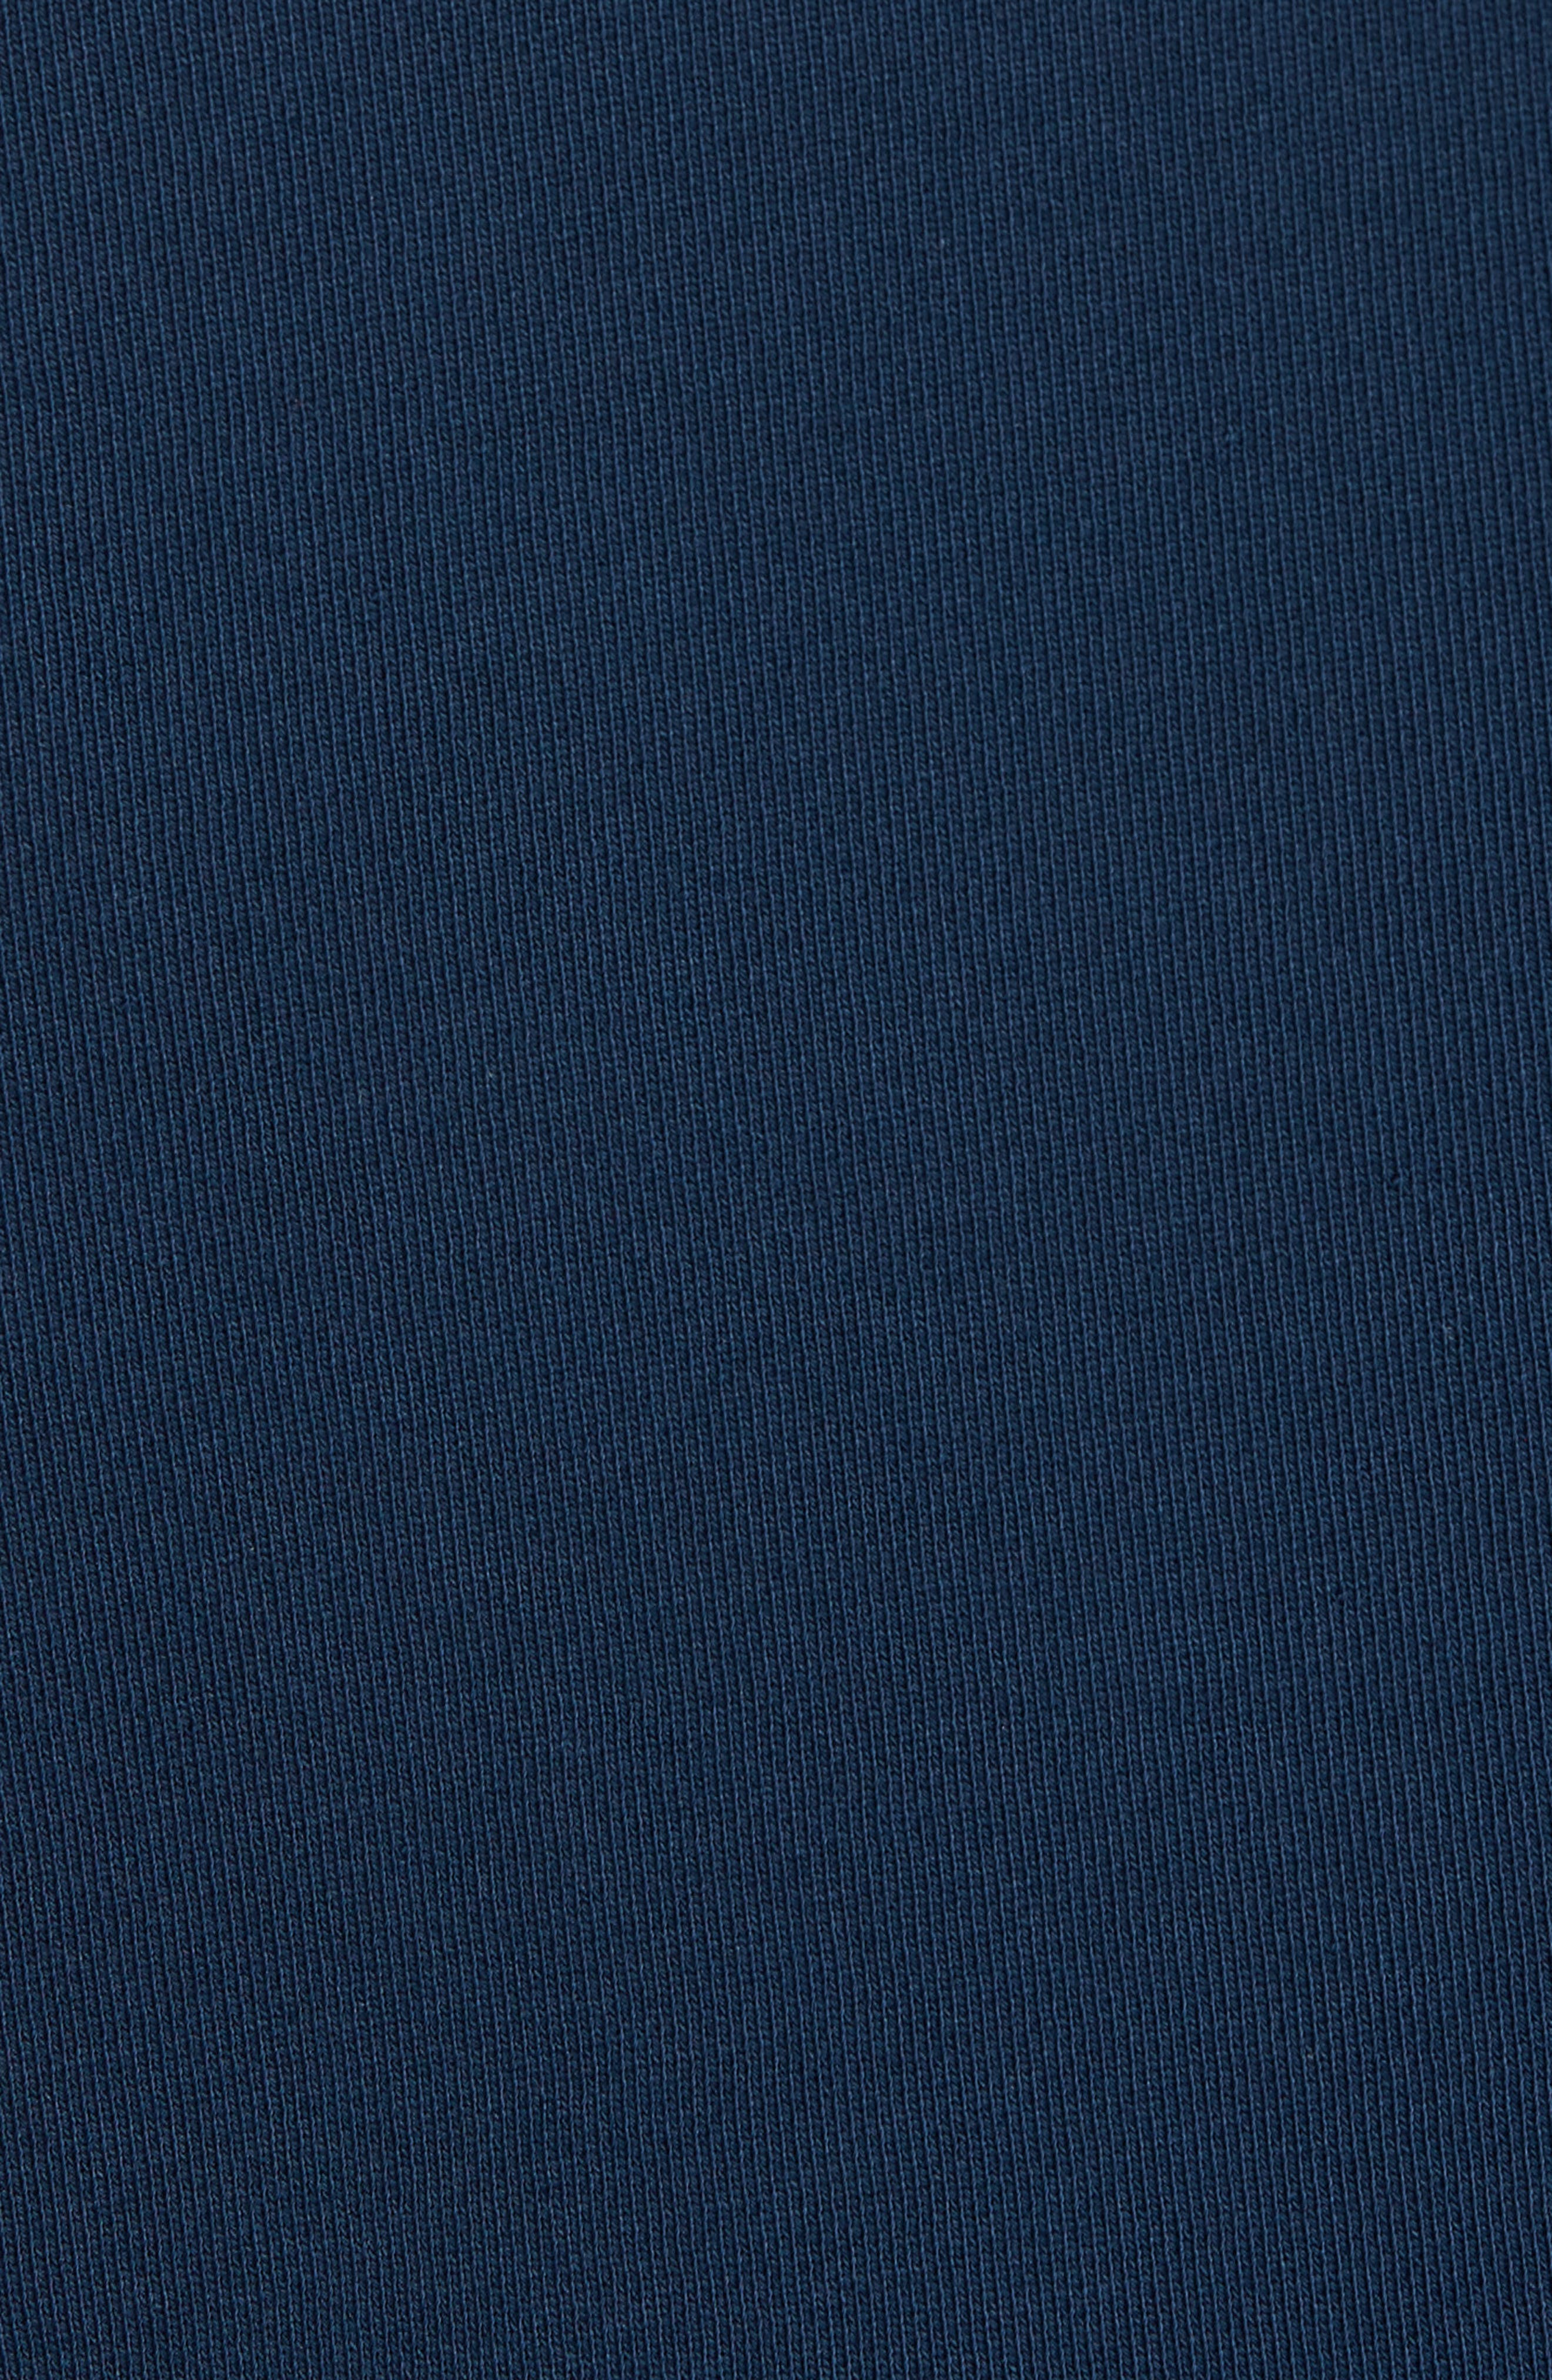 South Sea Raglan Sweatshirt,                             Alternate thumbnail 14, color,